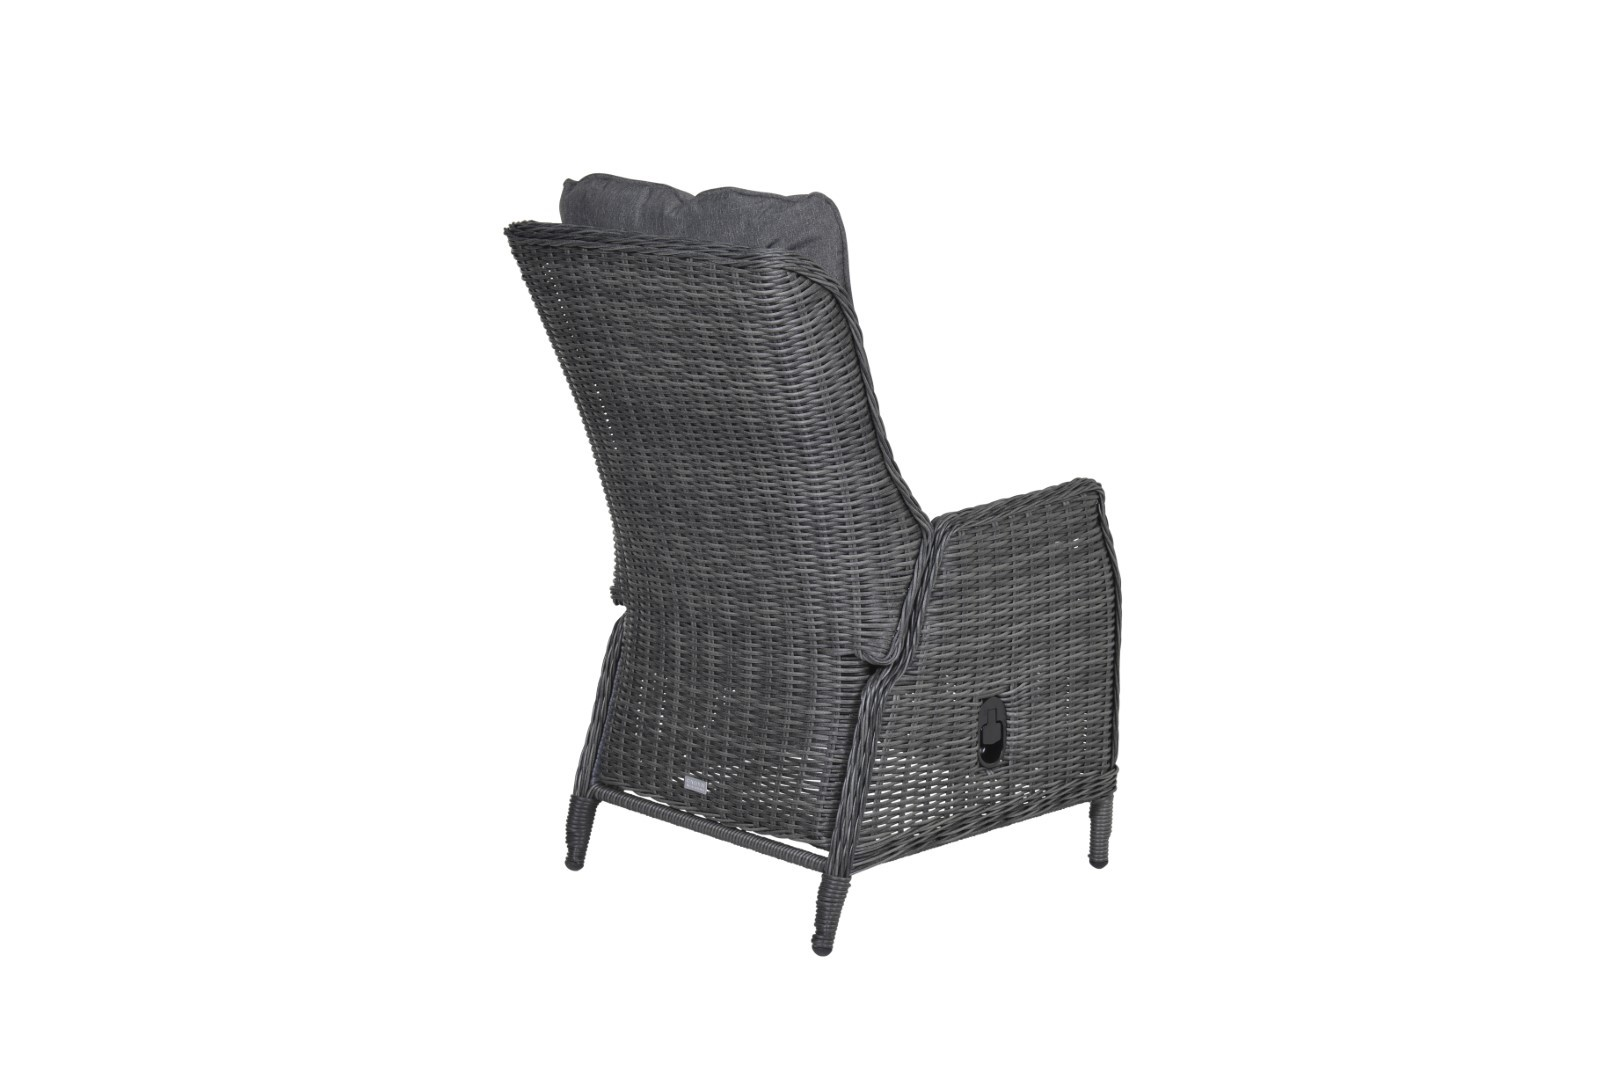 Osborne verstelbare fauteuil earl grey Hdiameter6,5mm/ reflex grey